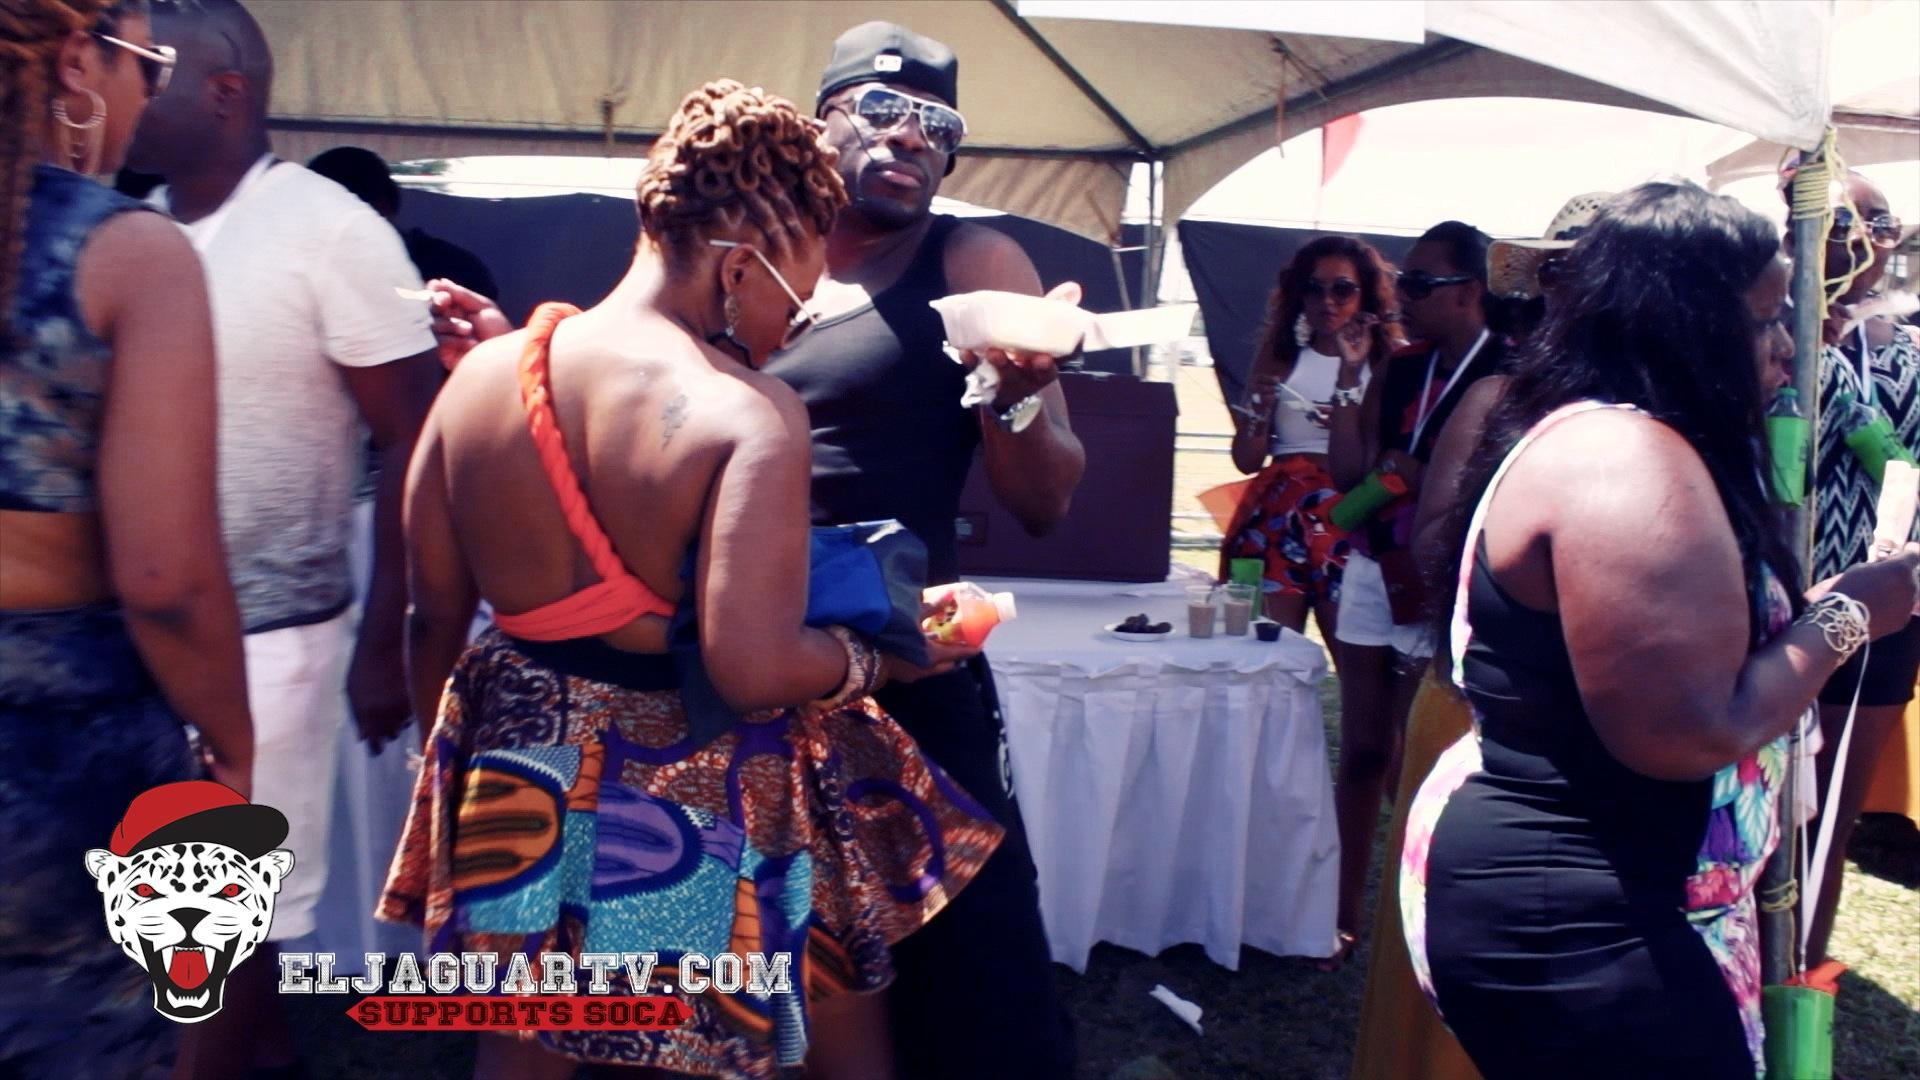 Trinidad Carnival 2015 ep 2 photo30.jpg